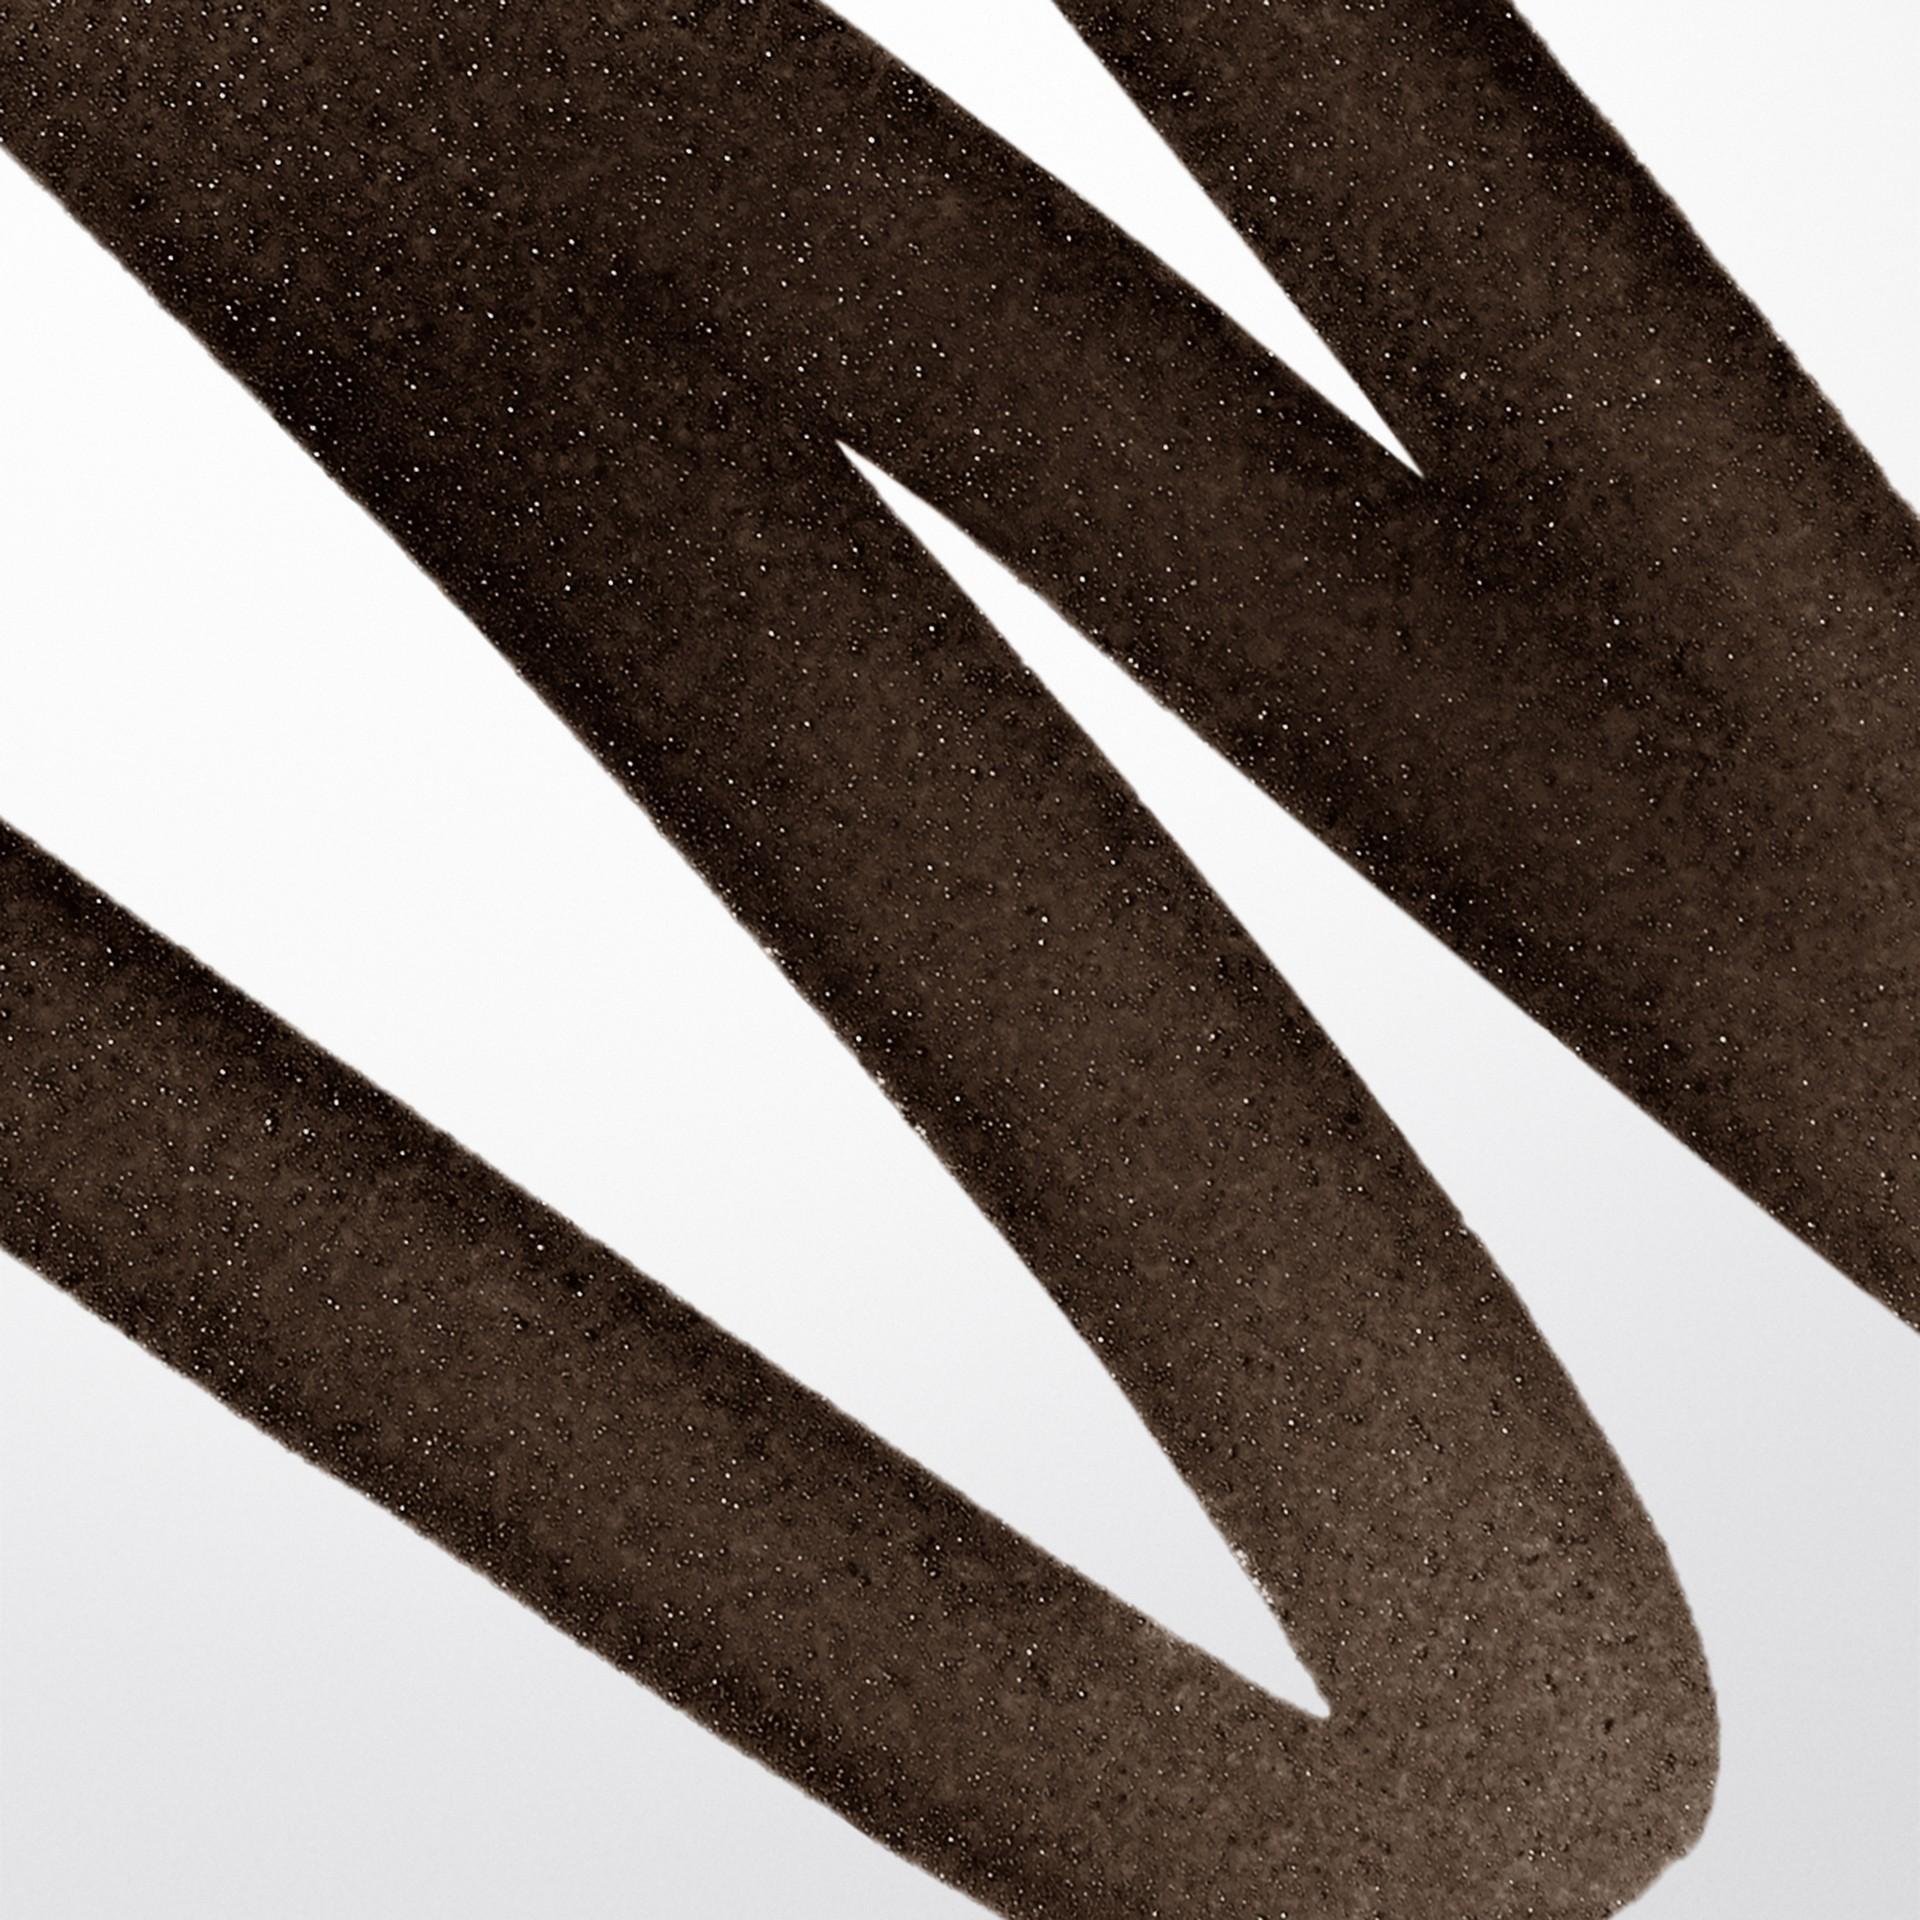 Chestnut brown 02 Effortless Liquid Eyeliner - Chestnut Brown No.02 - gallery image 2